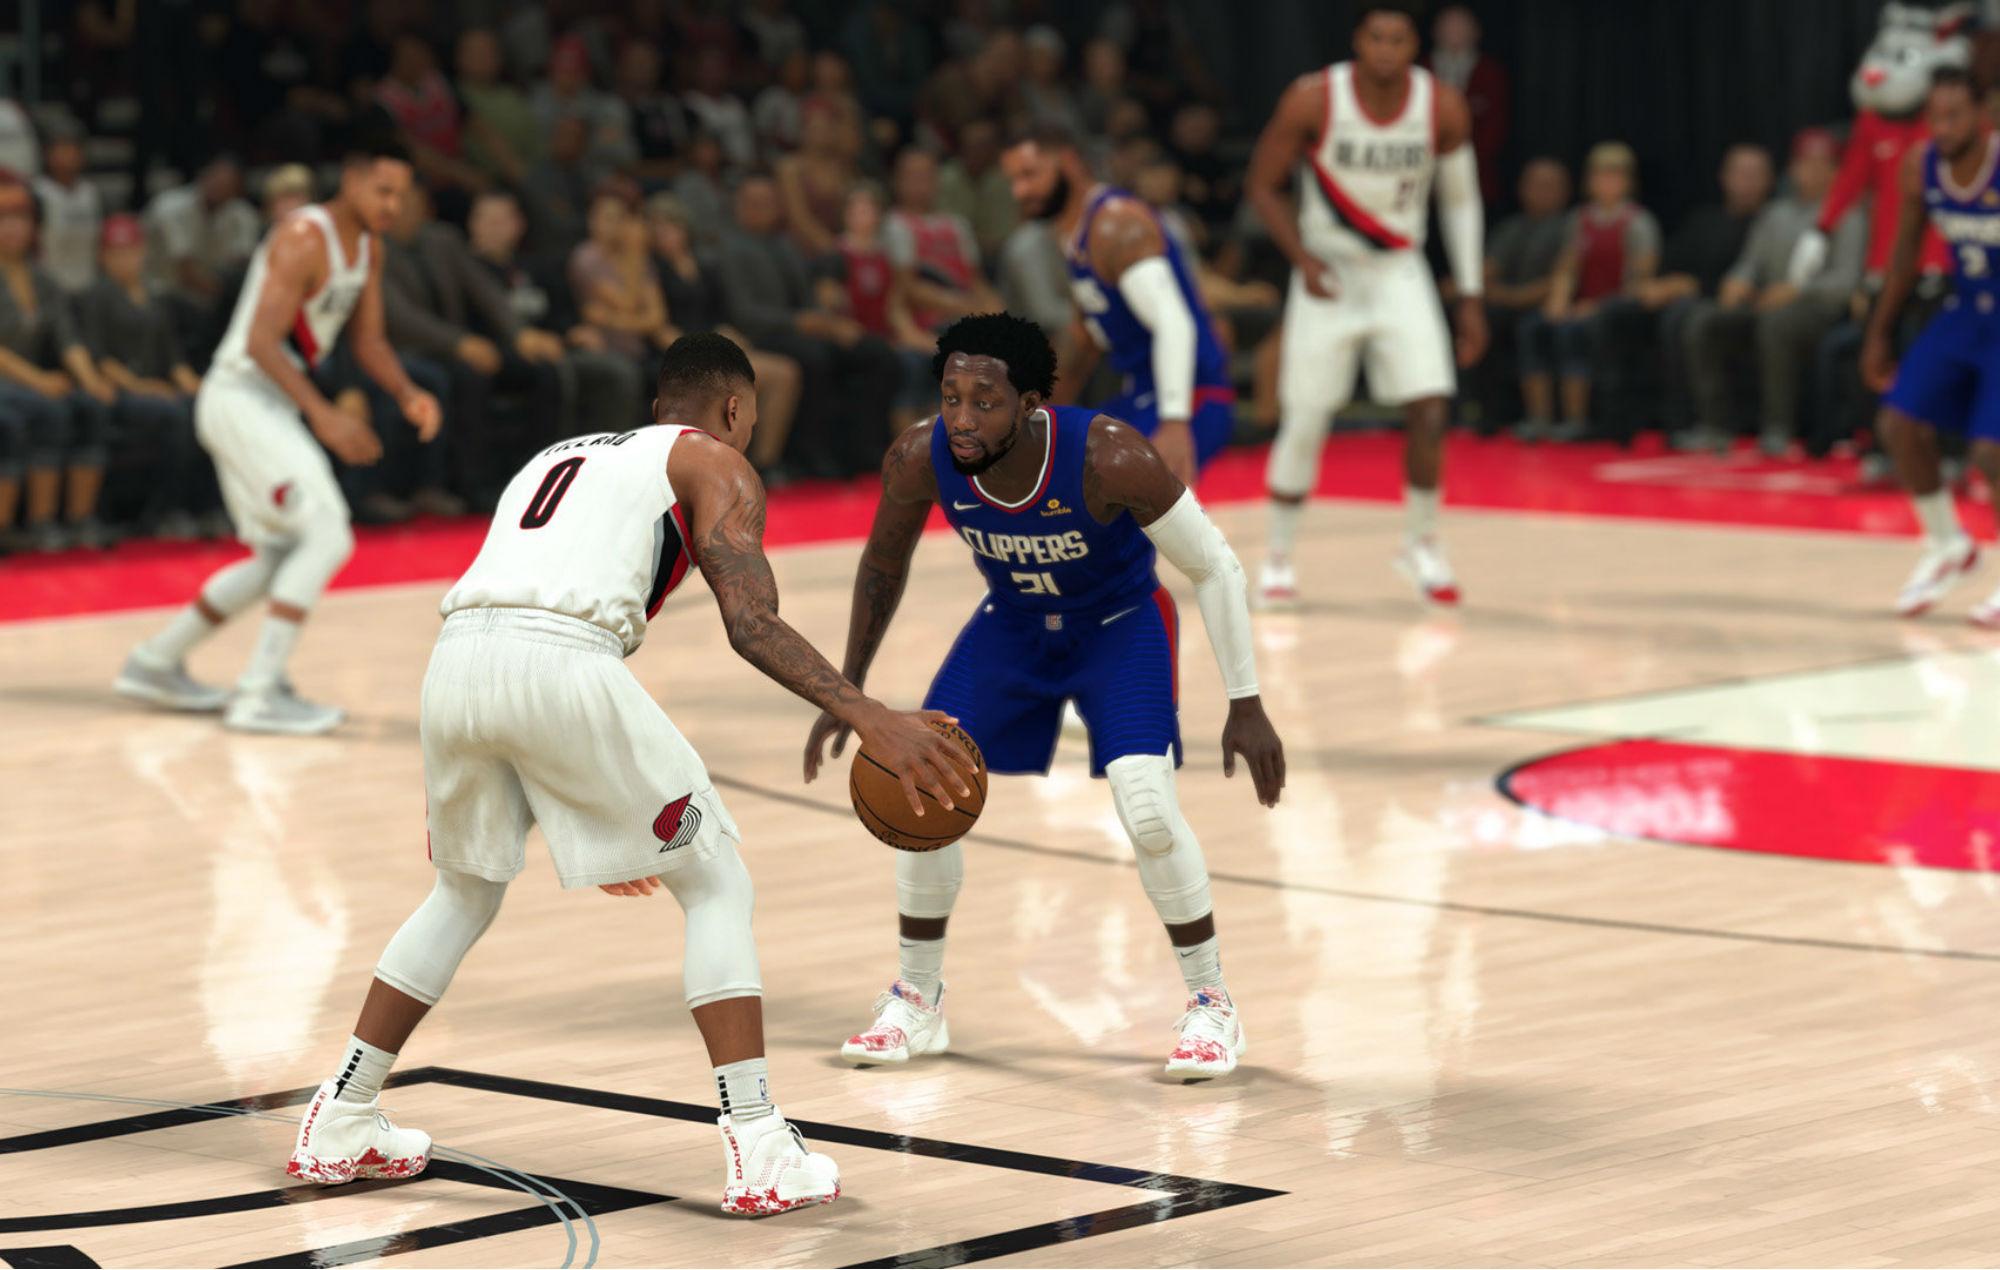 NBA 2K21 w wersji na nowe konsole. 2K Sports publikuje zwiastun